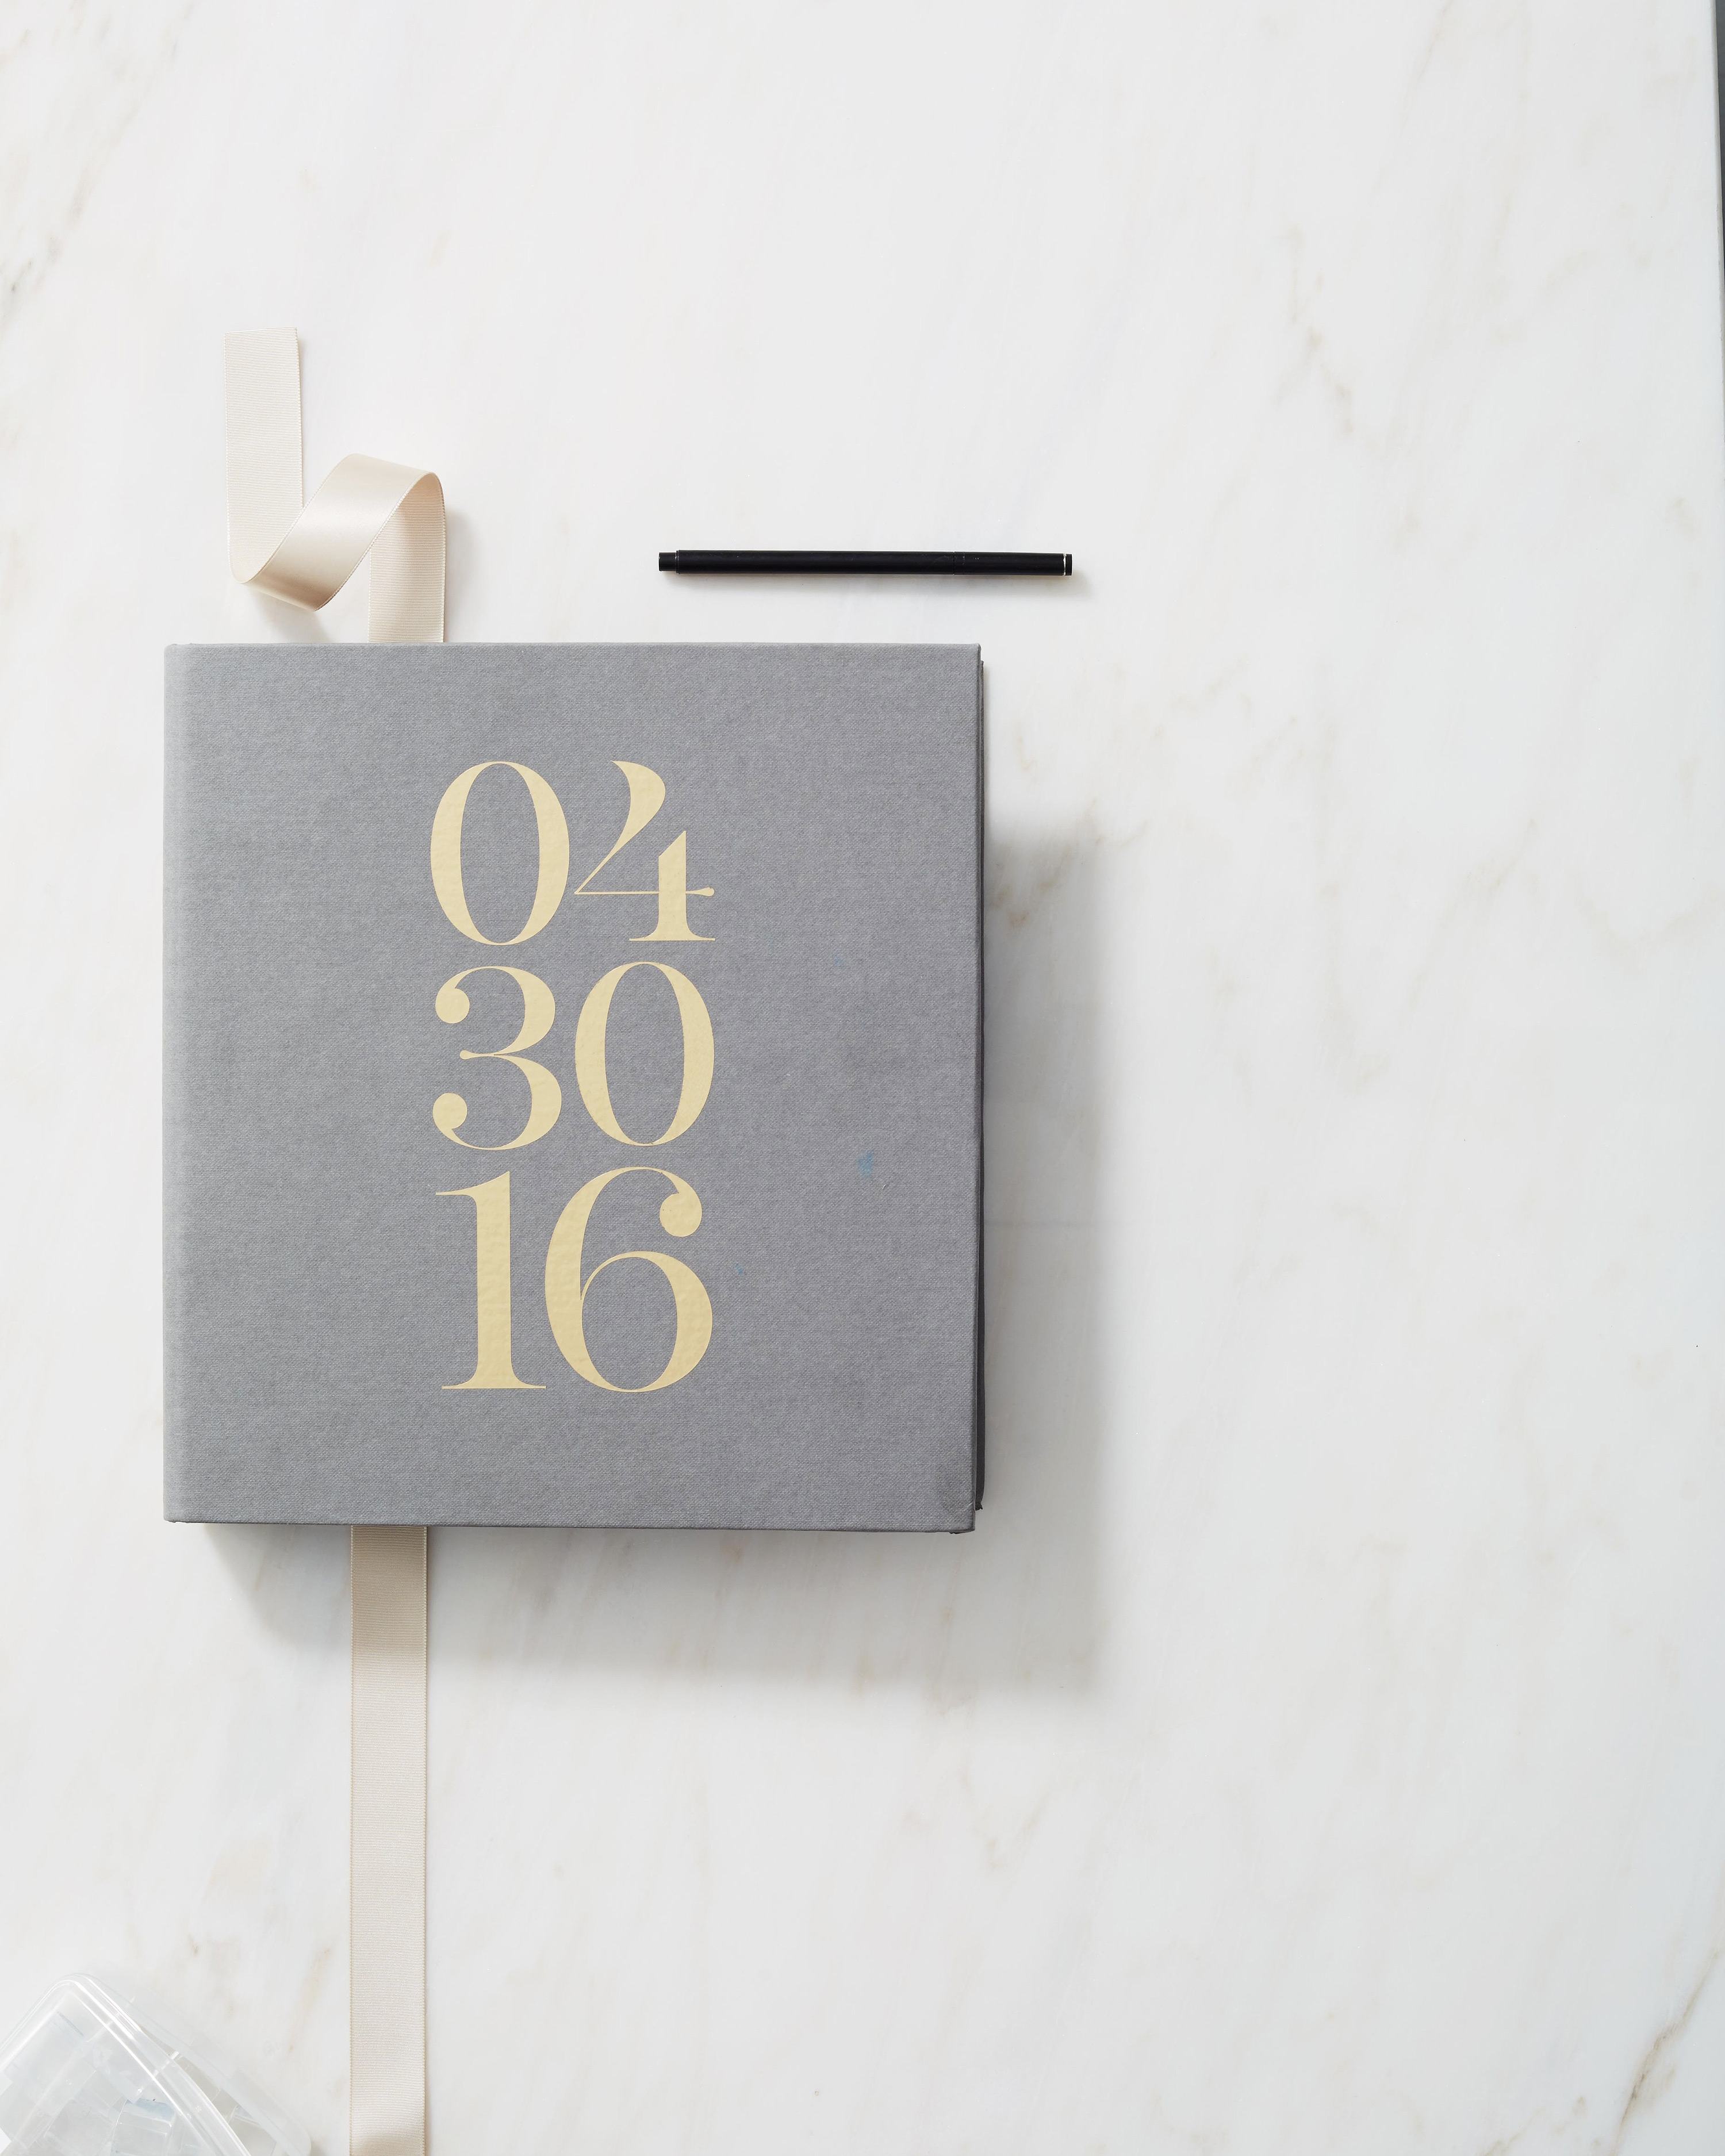 guest-book-foil-decal-customized-193-d112790.jpg